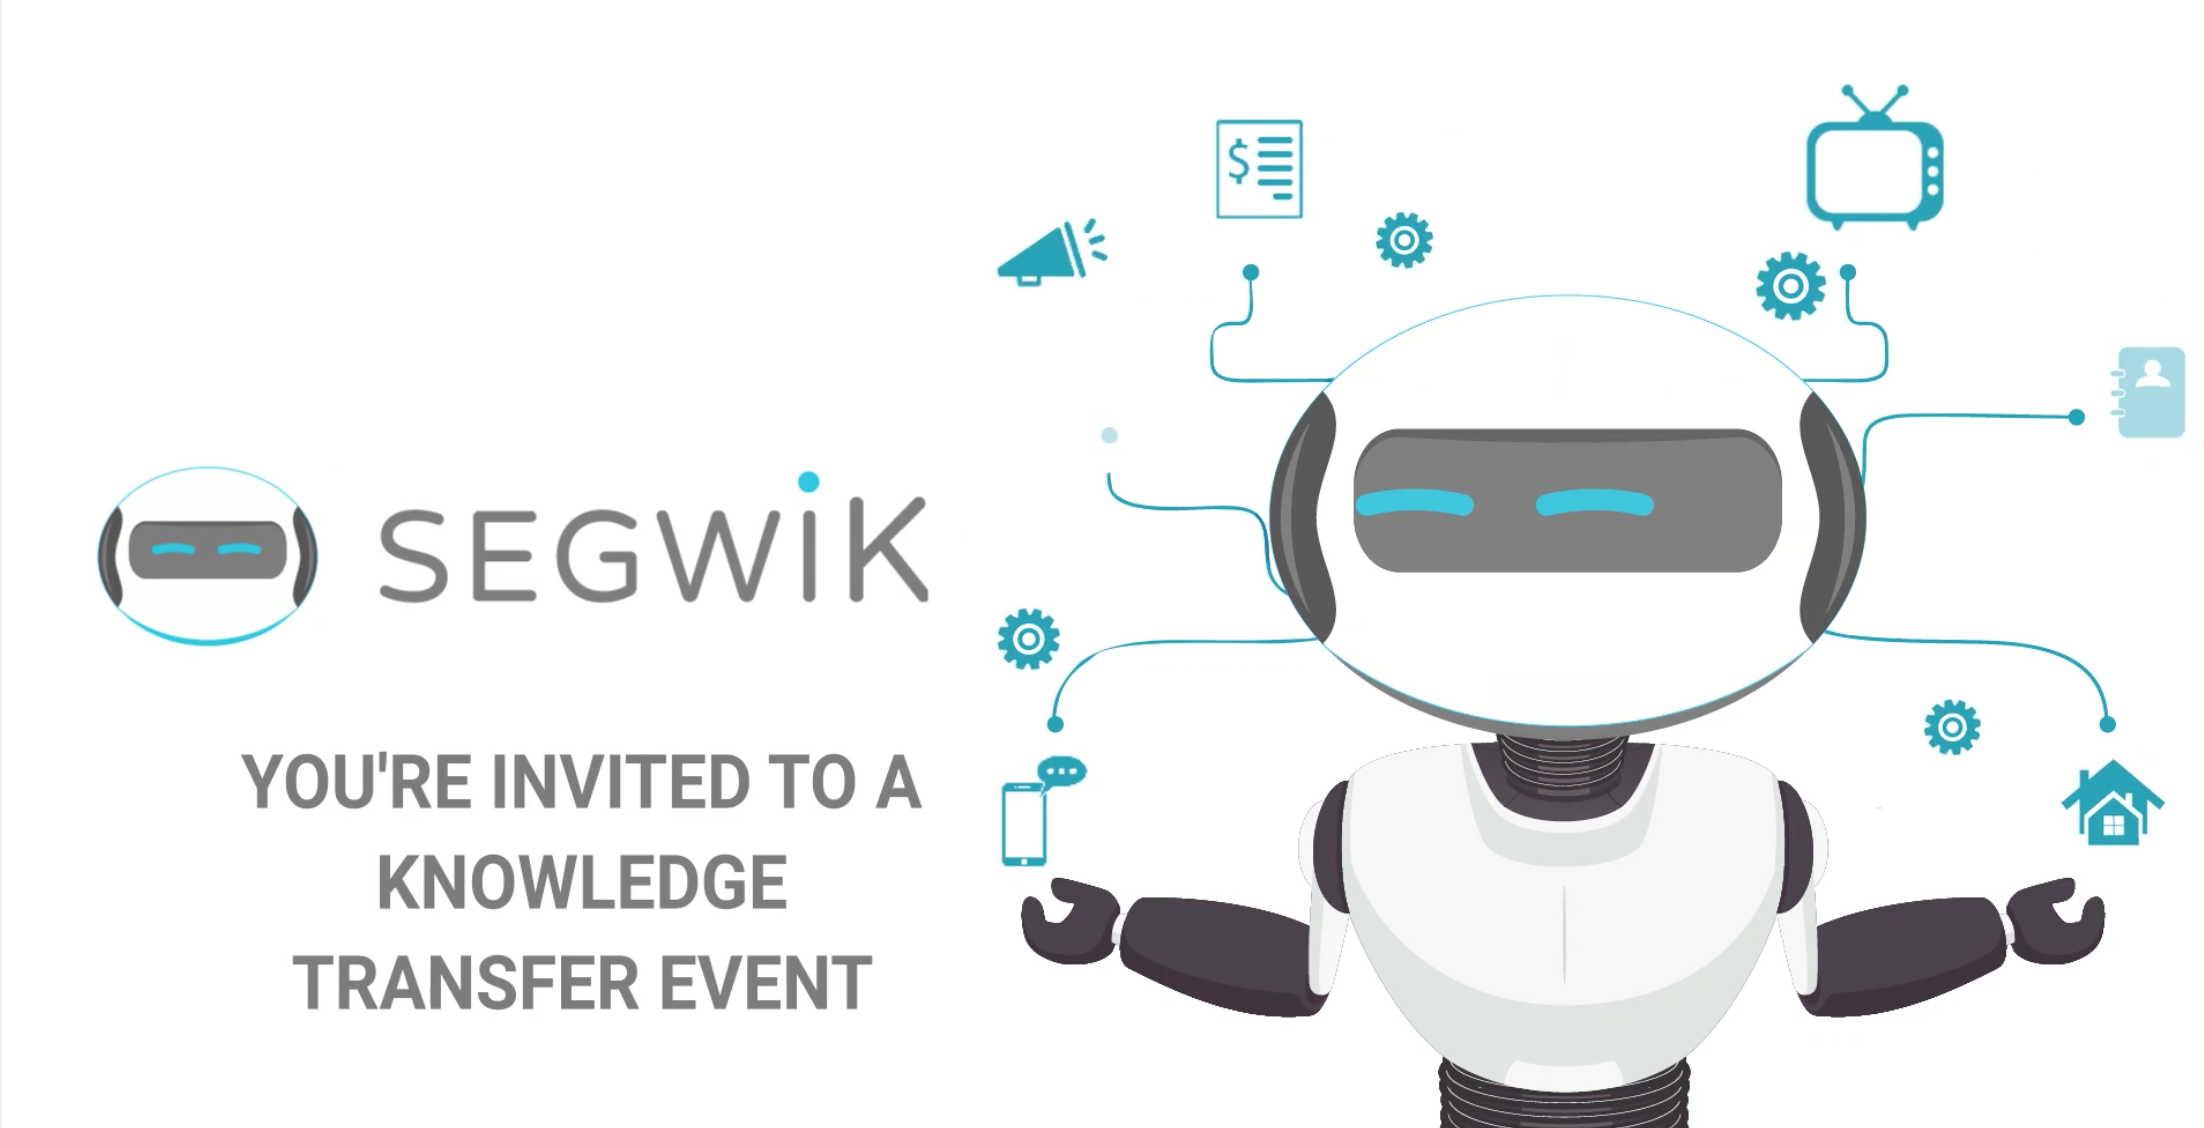 Segwik's First Knowledge Transfer Event